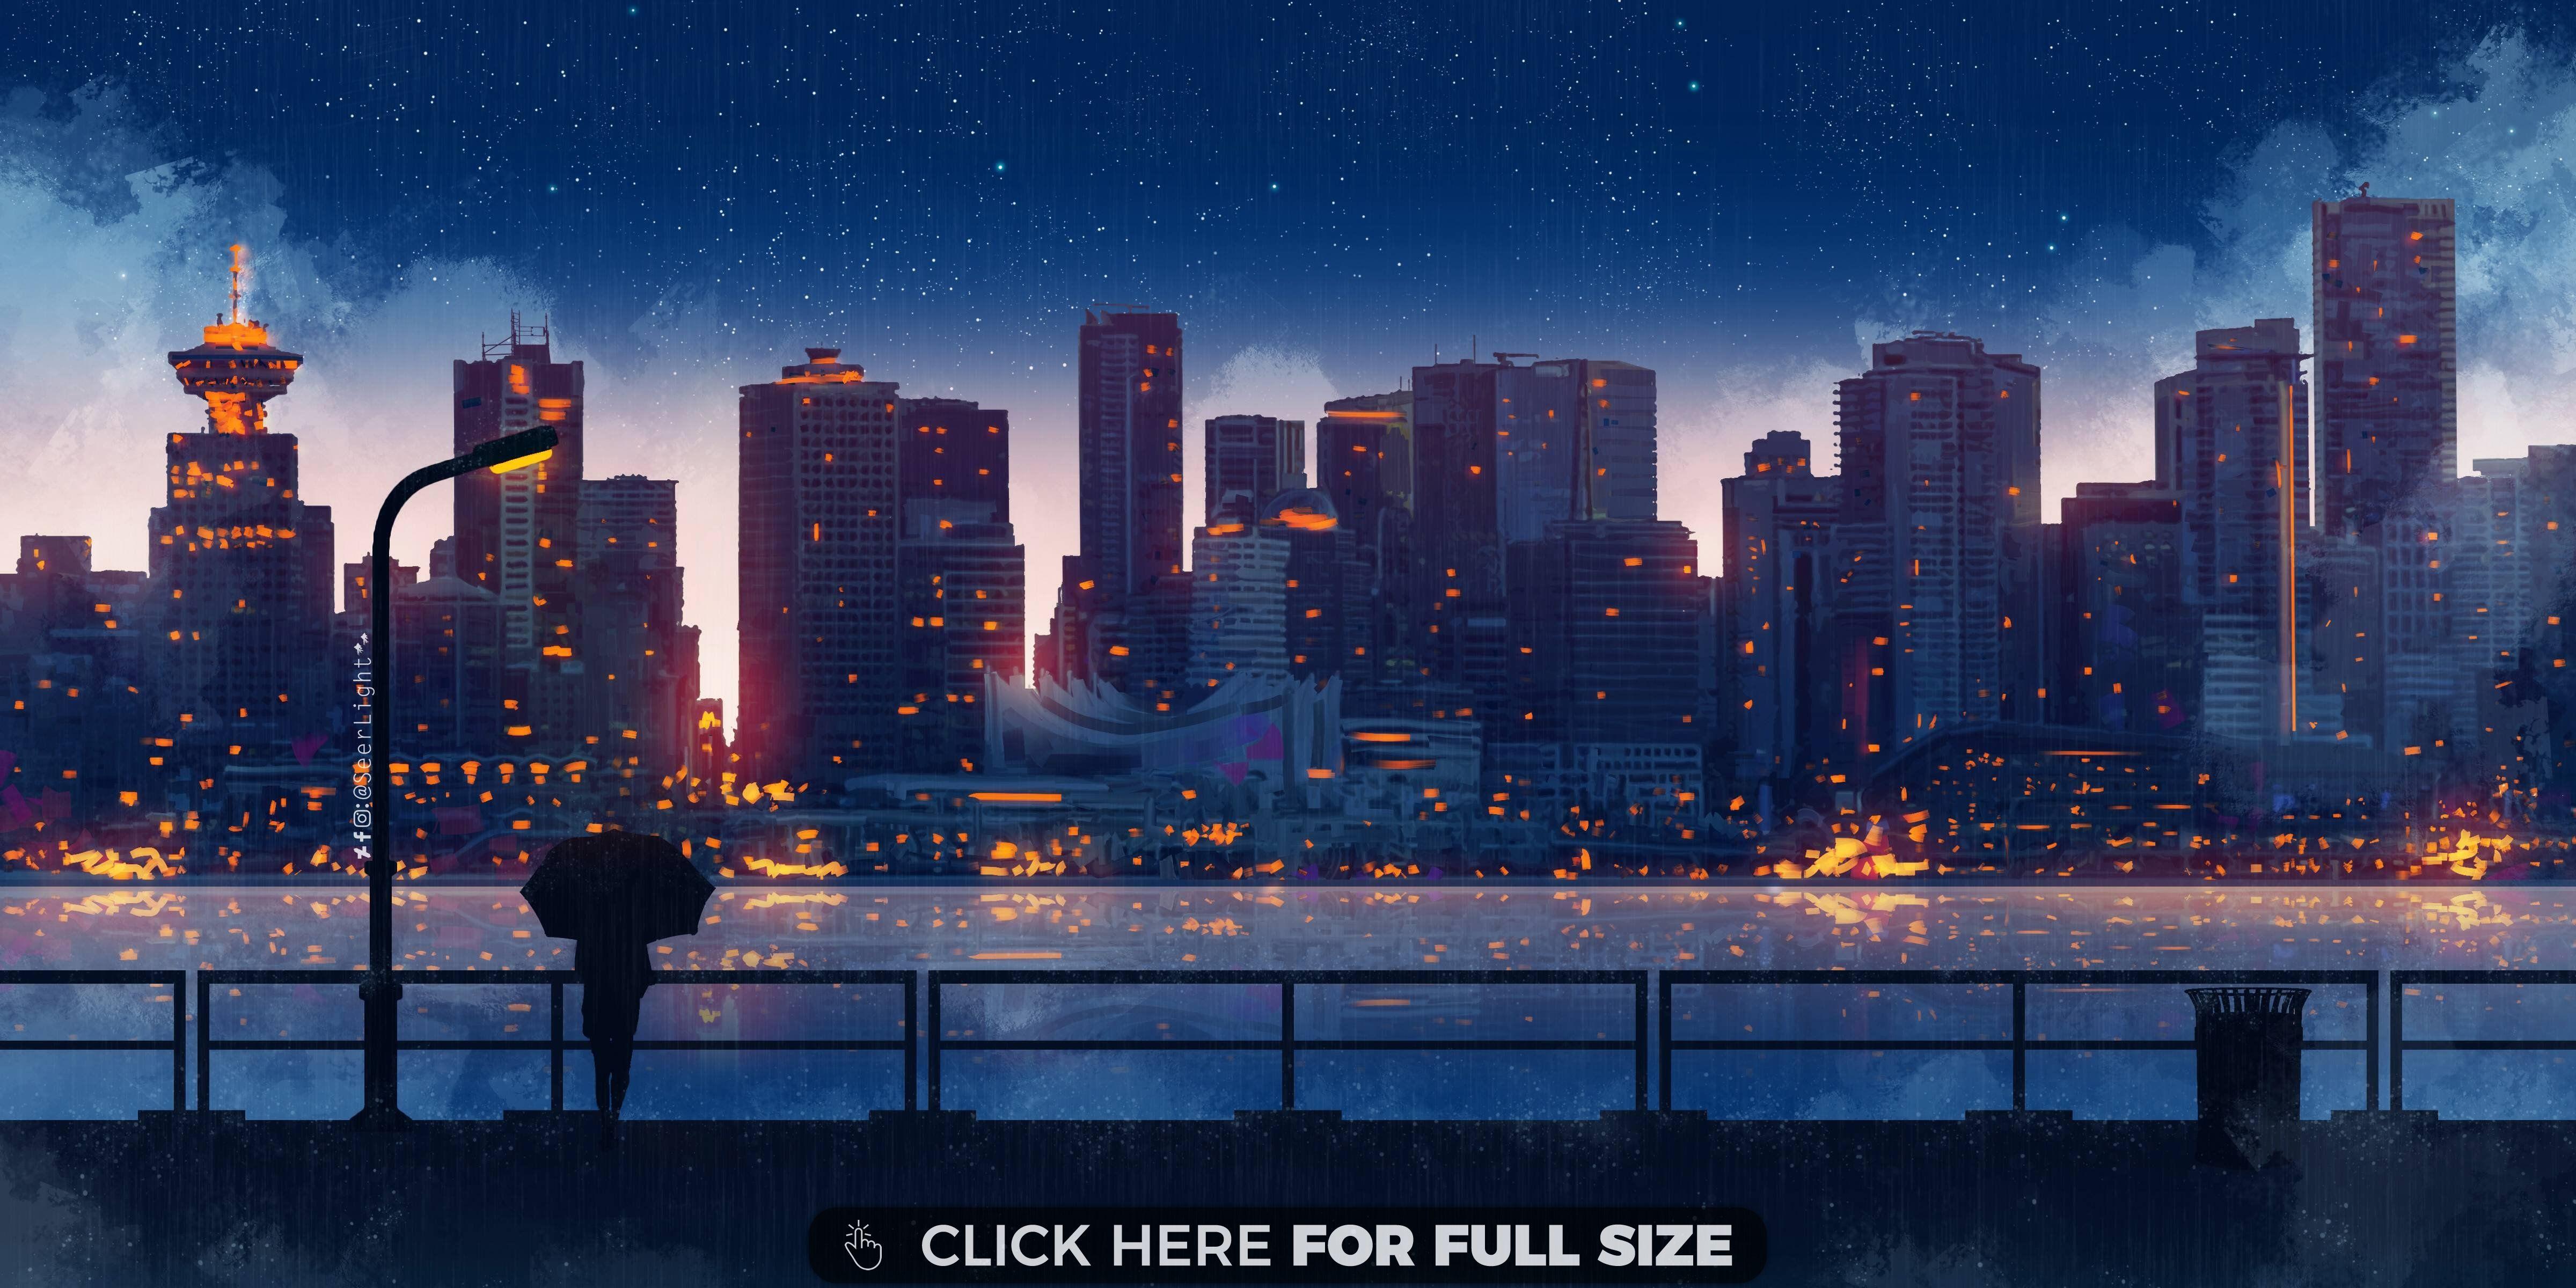 A Rainy Night 4k Wallpaper Cityscape Wallpaper City Wallpaper Anime City Anime city night wallpaper 4k